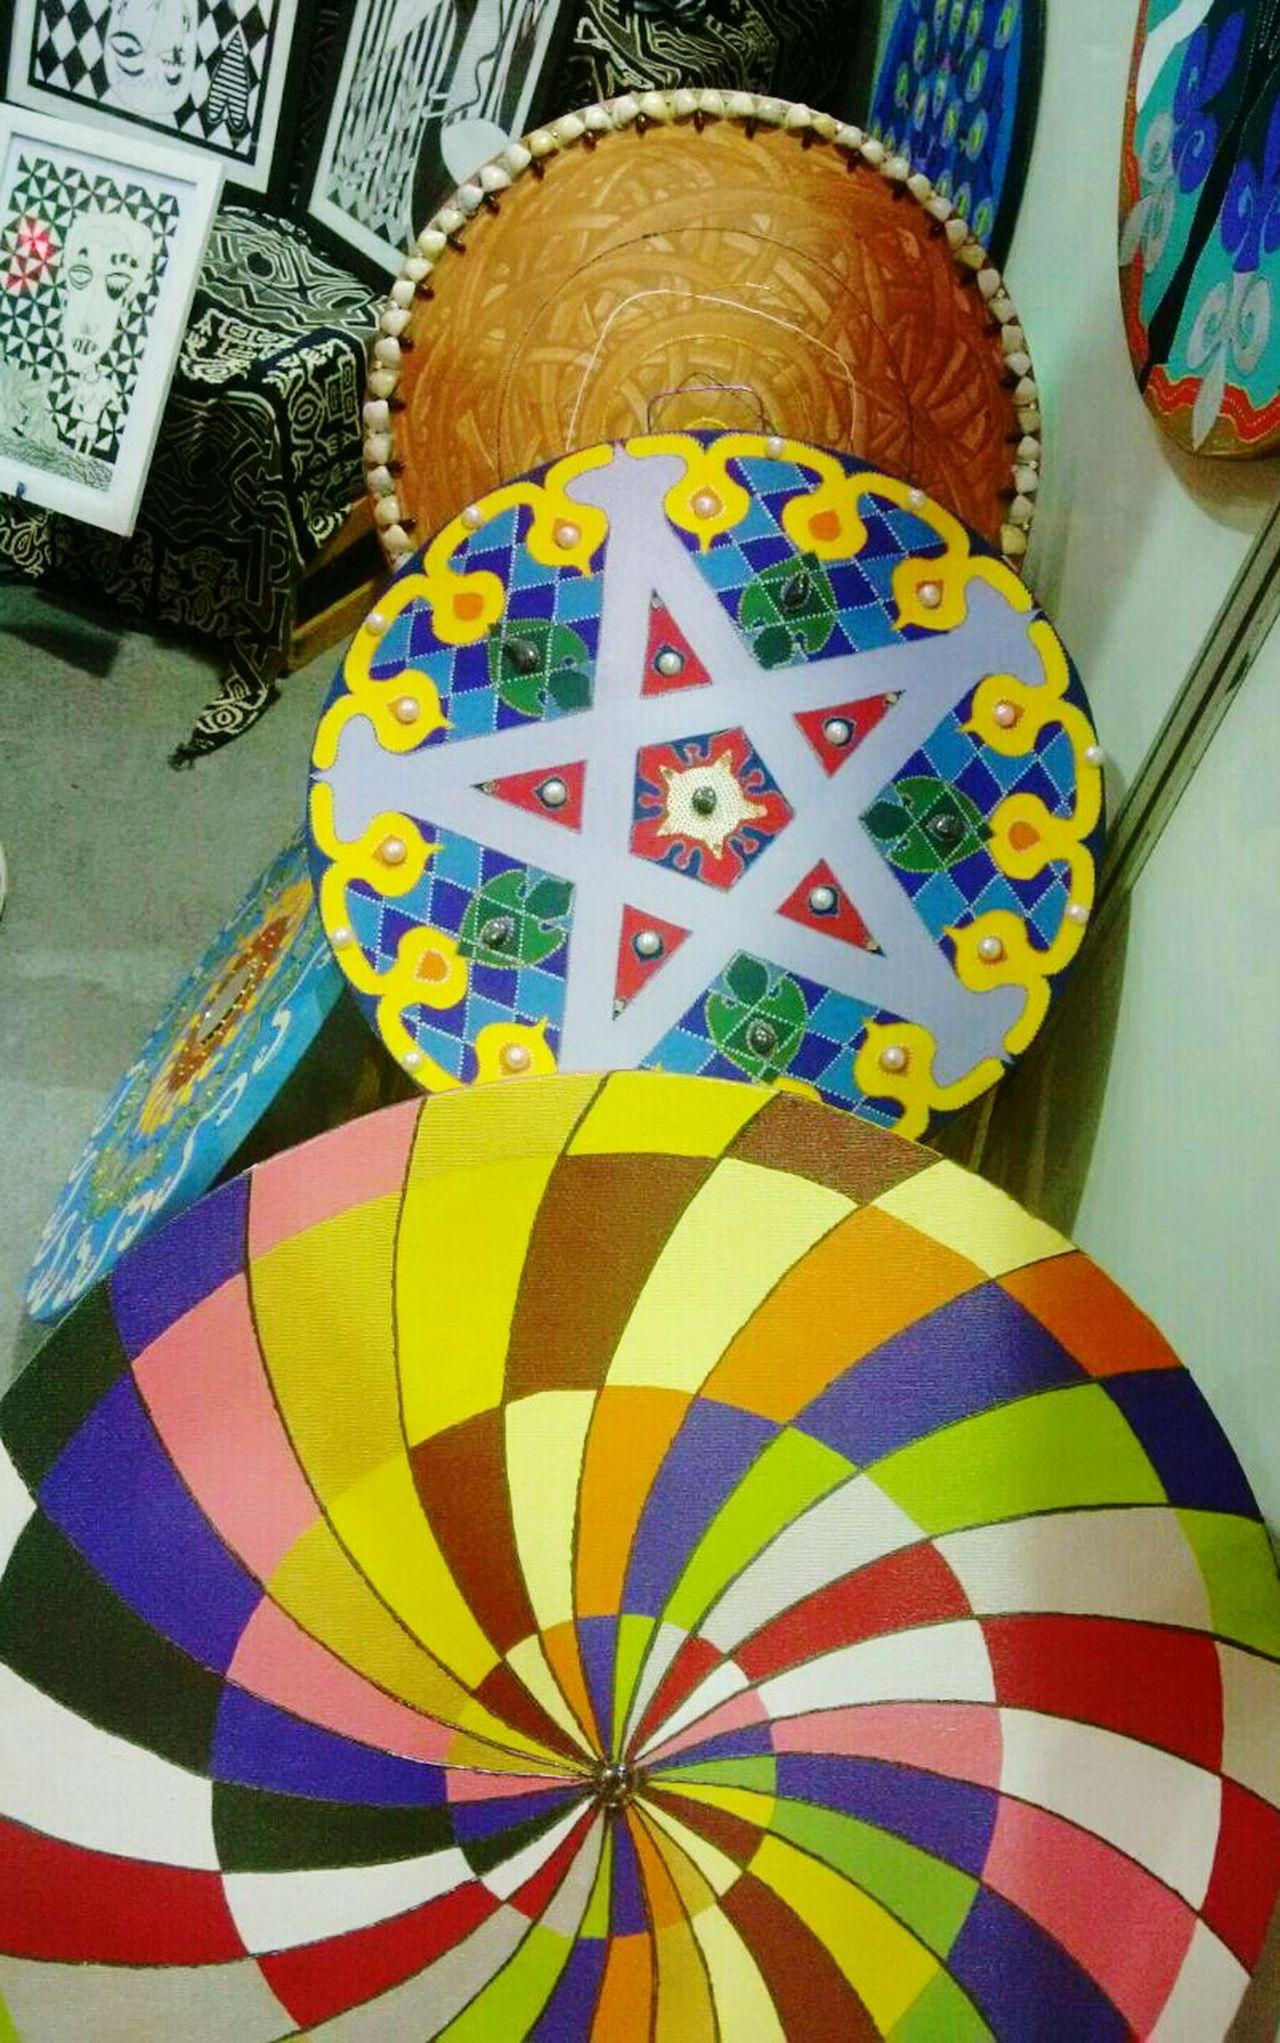 🌸 Happy Sunday for everyone 🌸 Decoration Decor Decorative Art Craft Crafts Multi Colored Mandala Mandala Art Art Art Gallery Simplicity Day No People Colorful Colors Colour Of Life I LOVE PHOTOGRAPHY EyeEm Best Shots EyeEmBestPics EyeEm Gallery Brazilian Gallery Brasil Brazil 🌸🍃💋🍃🌸🌎✌